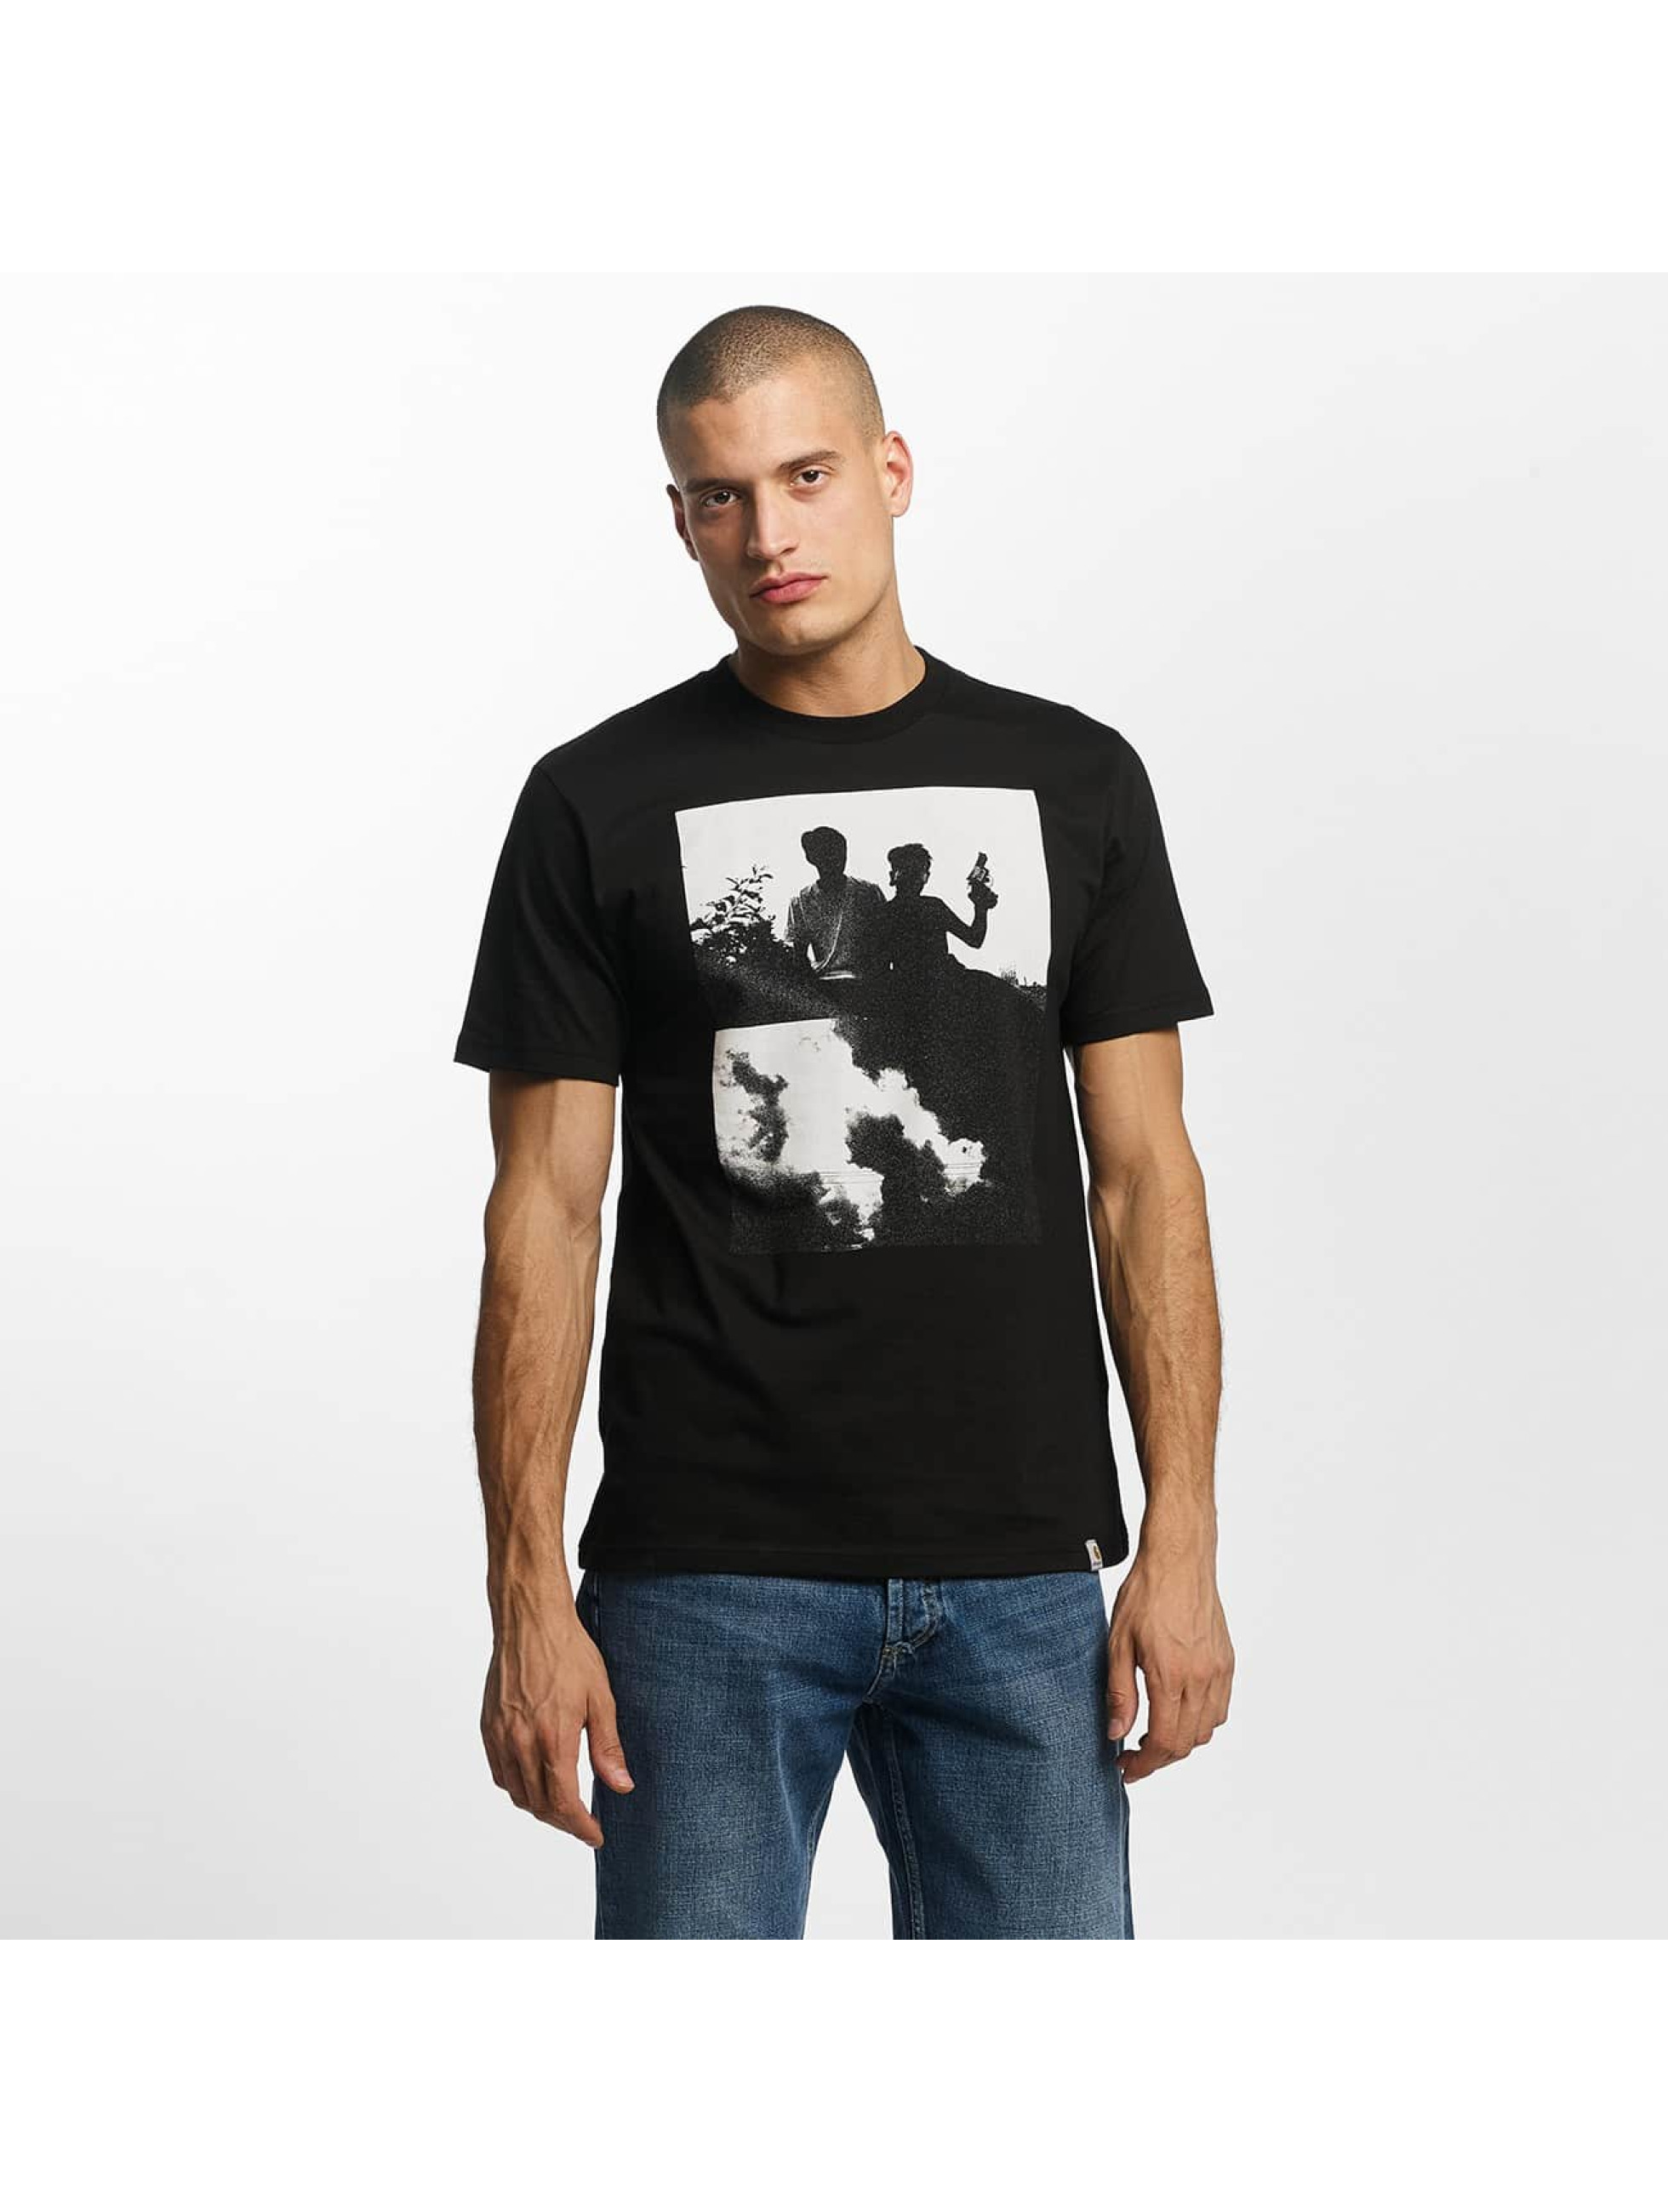 Carhartt WIP Männer T-Shirt Pistols in schwarz